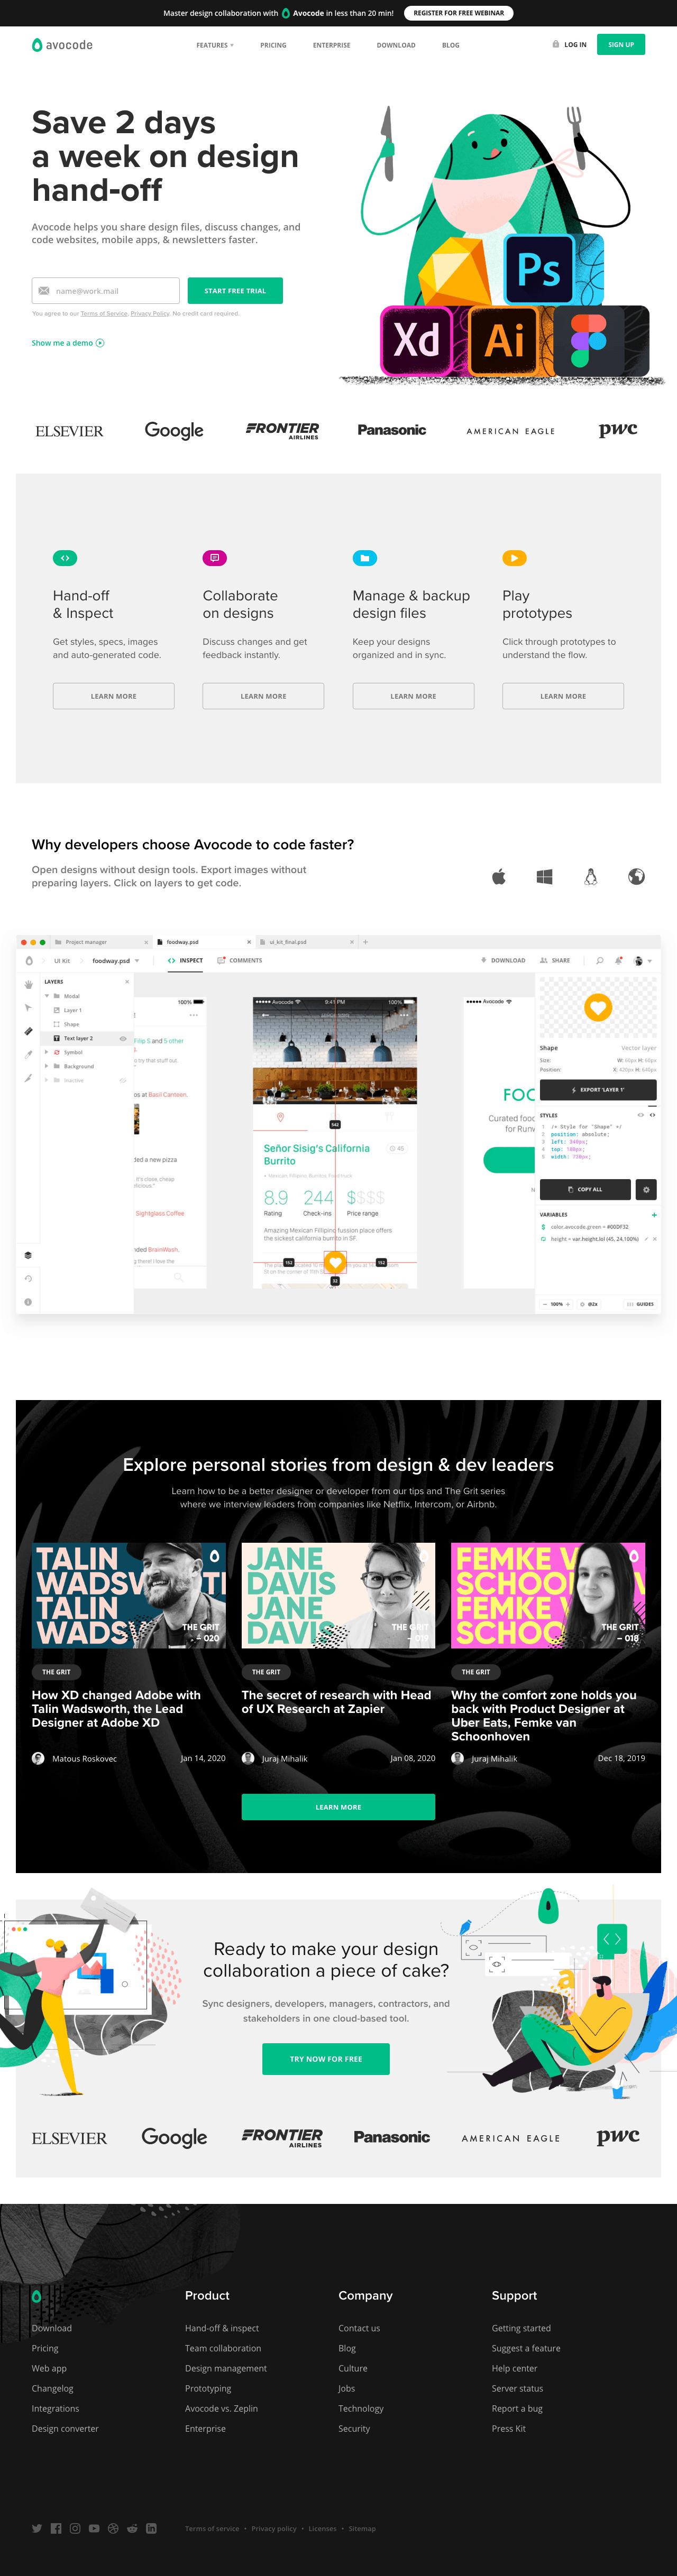 Avocode Landing Page In 2020 Landing Page Landing Page Inspiration Web Design